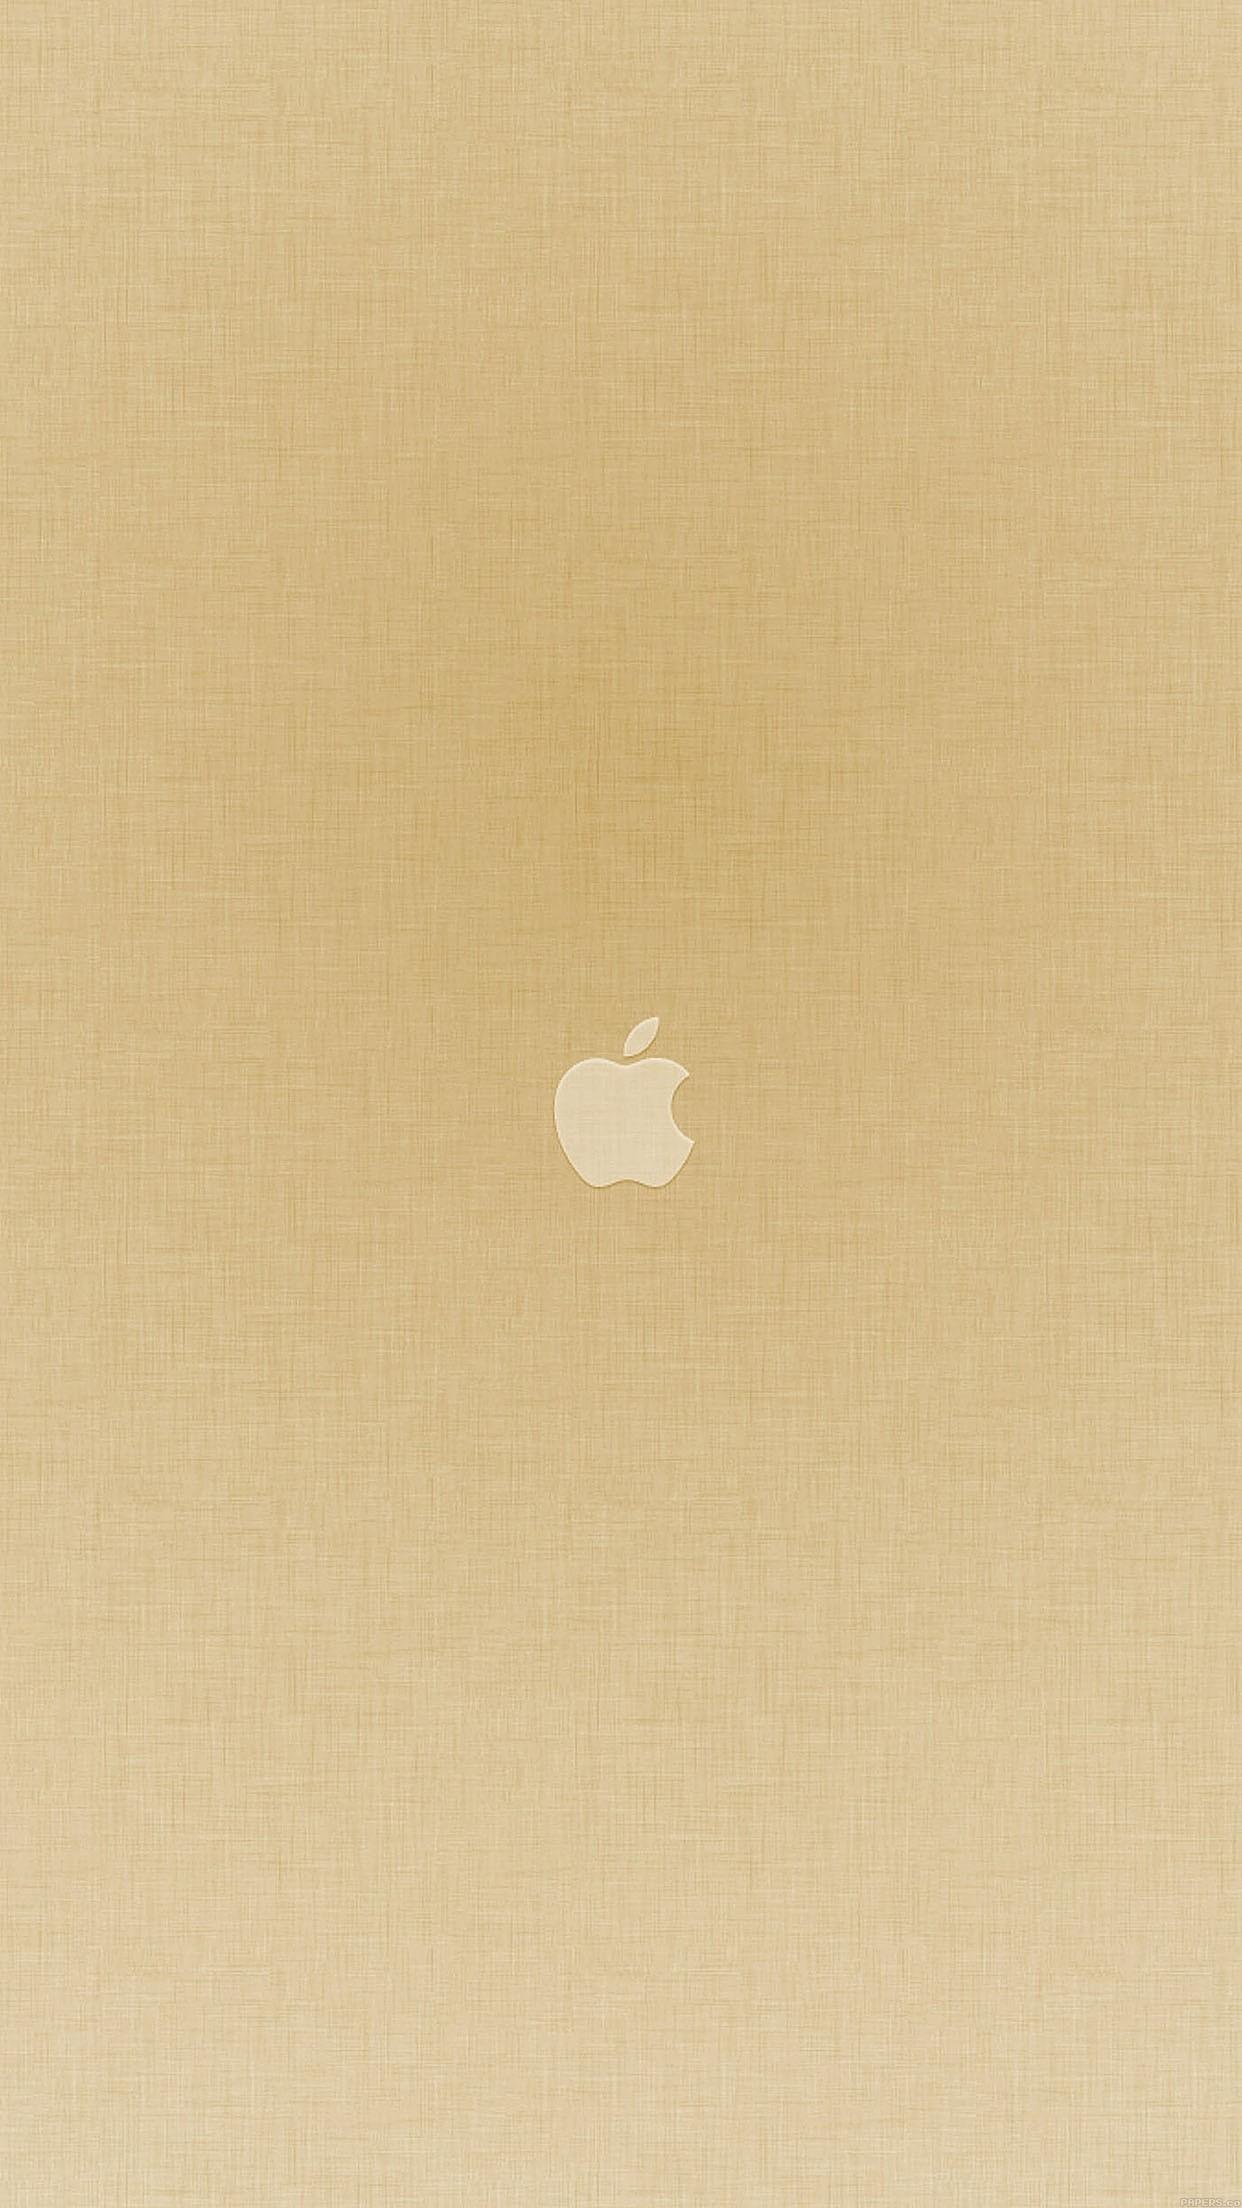 … Gold Iphone Wallpaper gold iphone wallpaper apple iphone 6 gold  wallpaper …